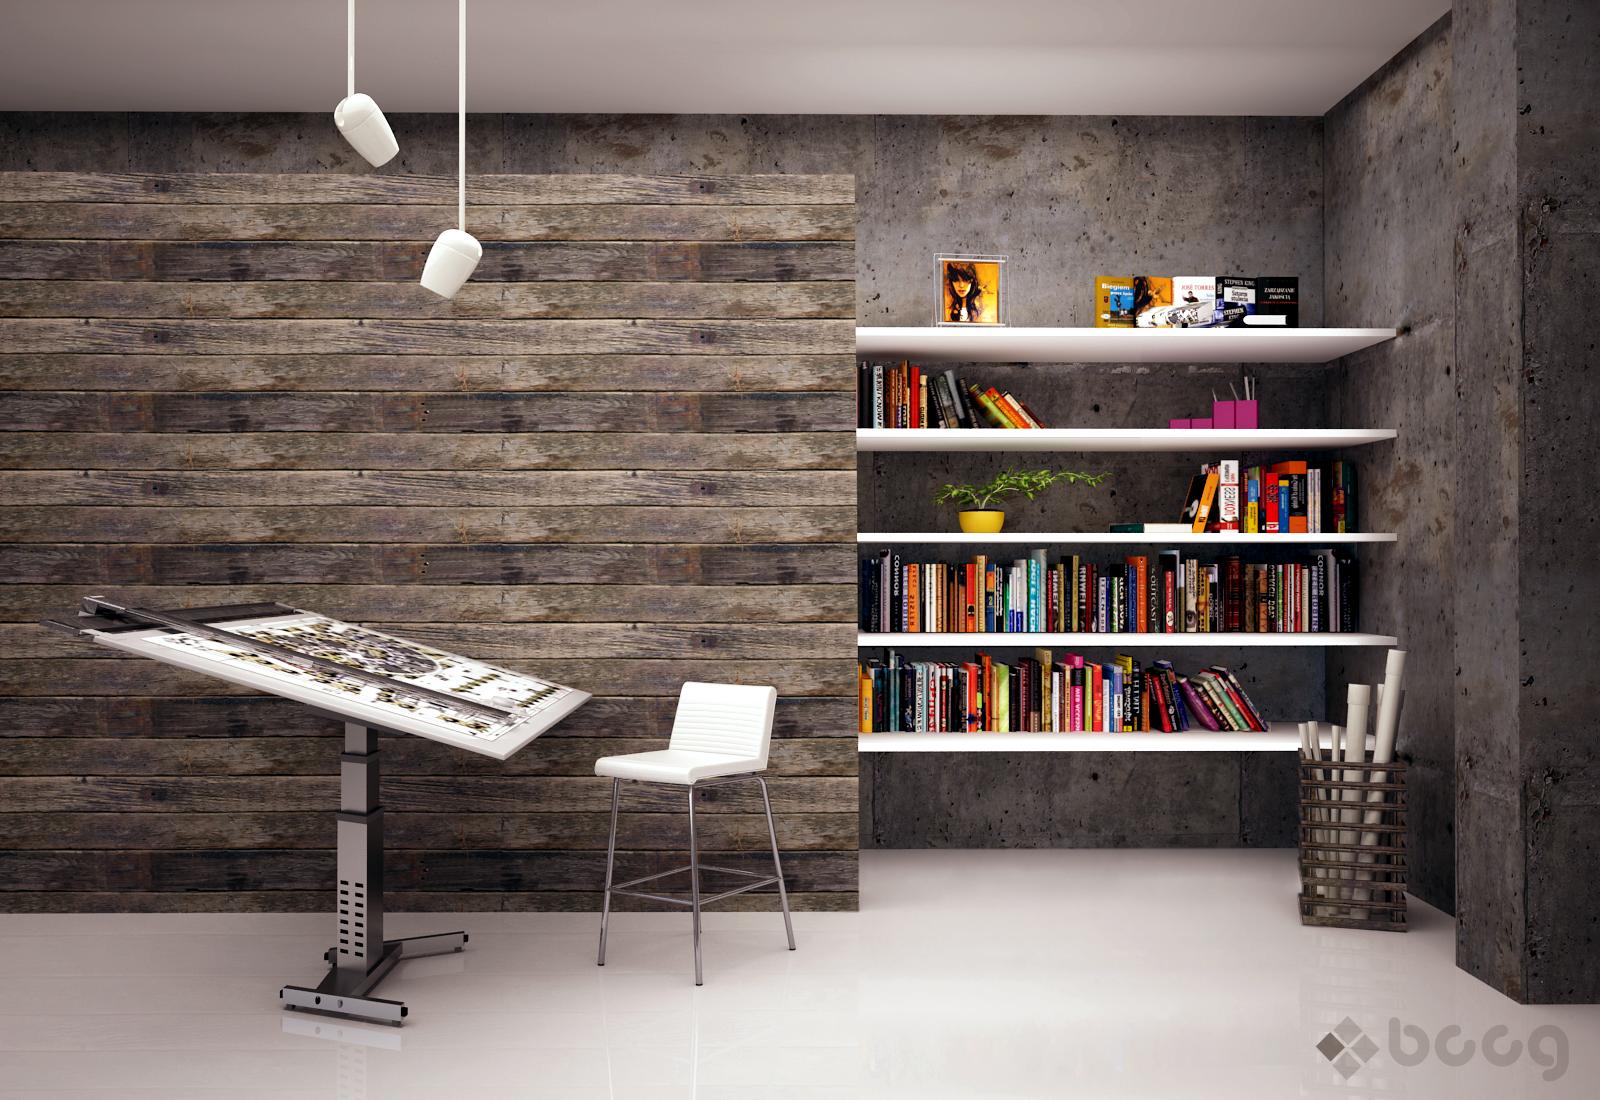 Architect's Studio by saescavipica on DeviantArt